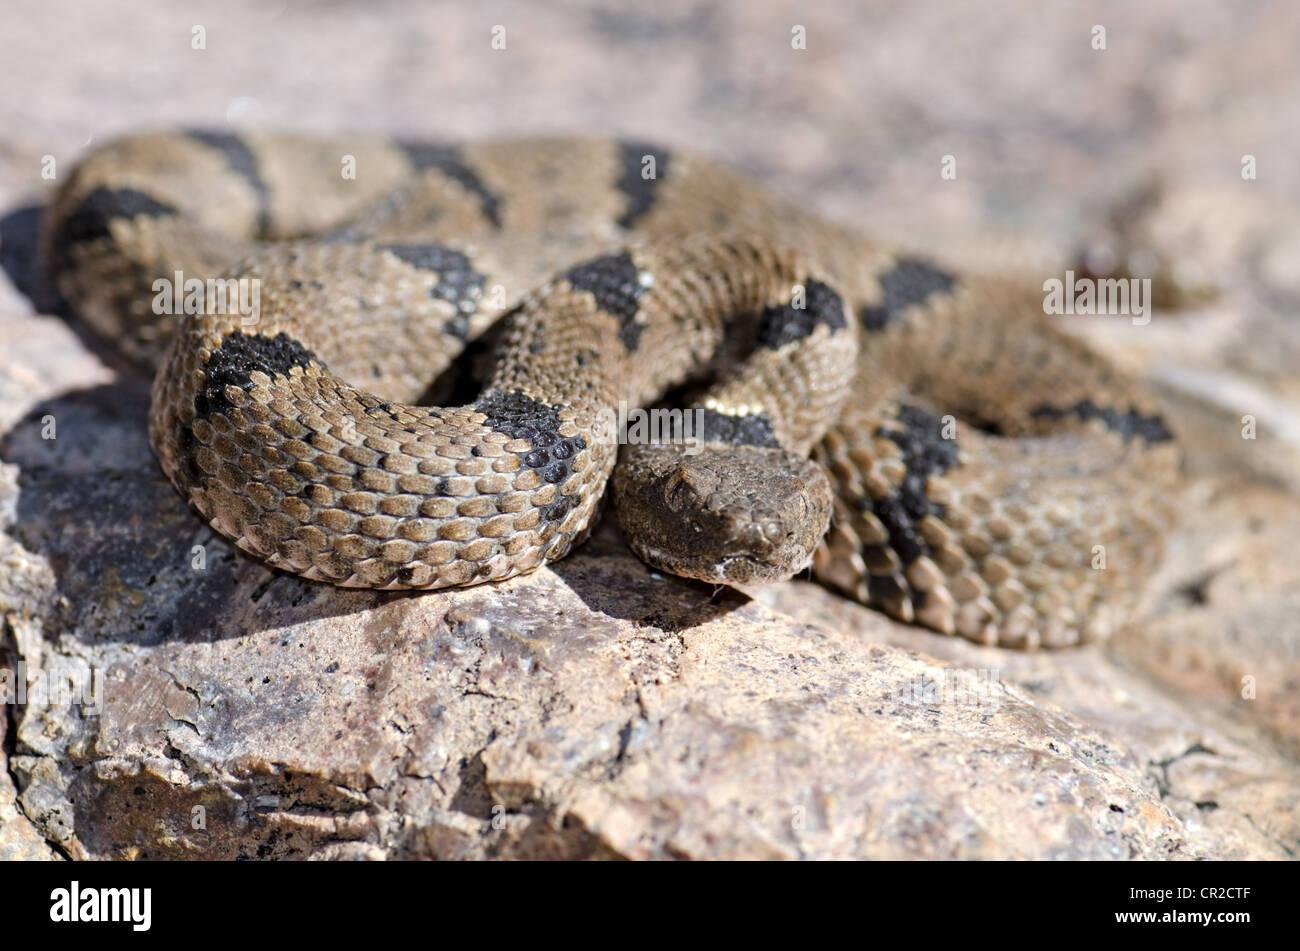 New mexico socorro county magdalena - Banded Rock Rattlesnake Crotalus Lepidus Klauberi Magdalena Mountains Socorro County New Mexico Usa